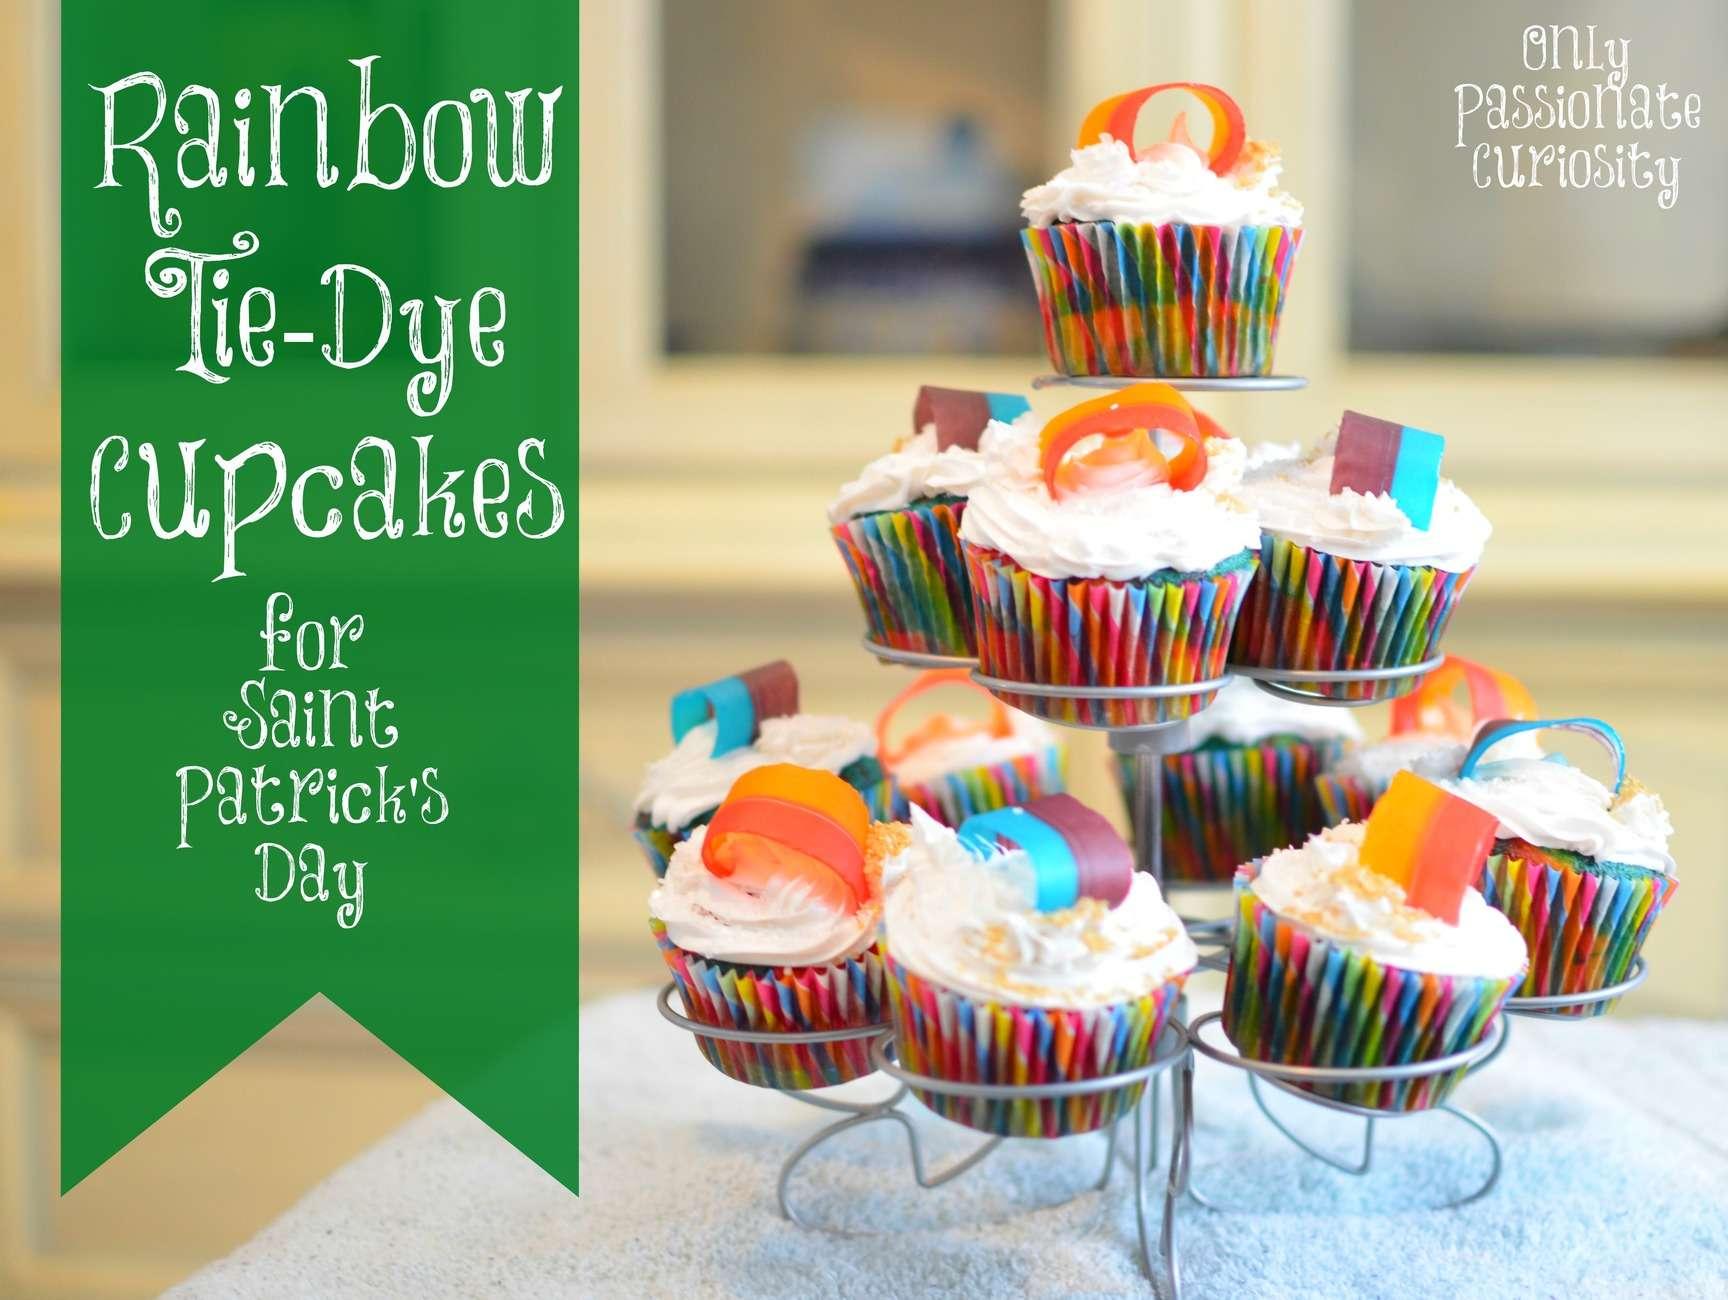 Rainbow Tie-Dye Cupcakes